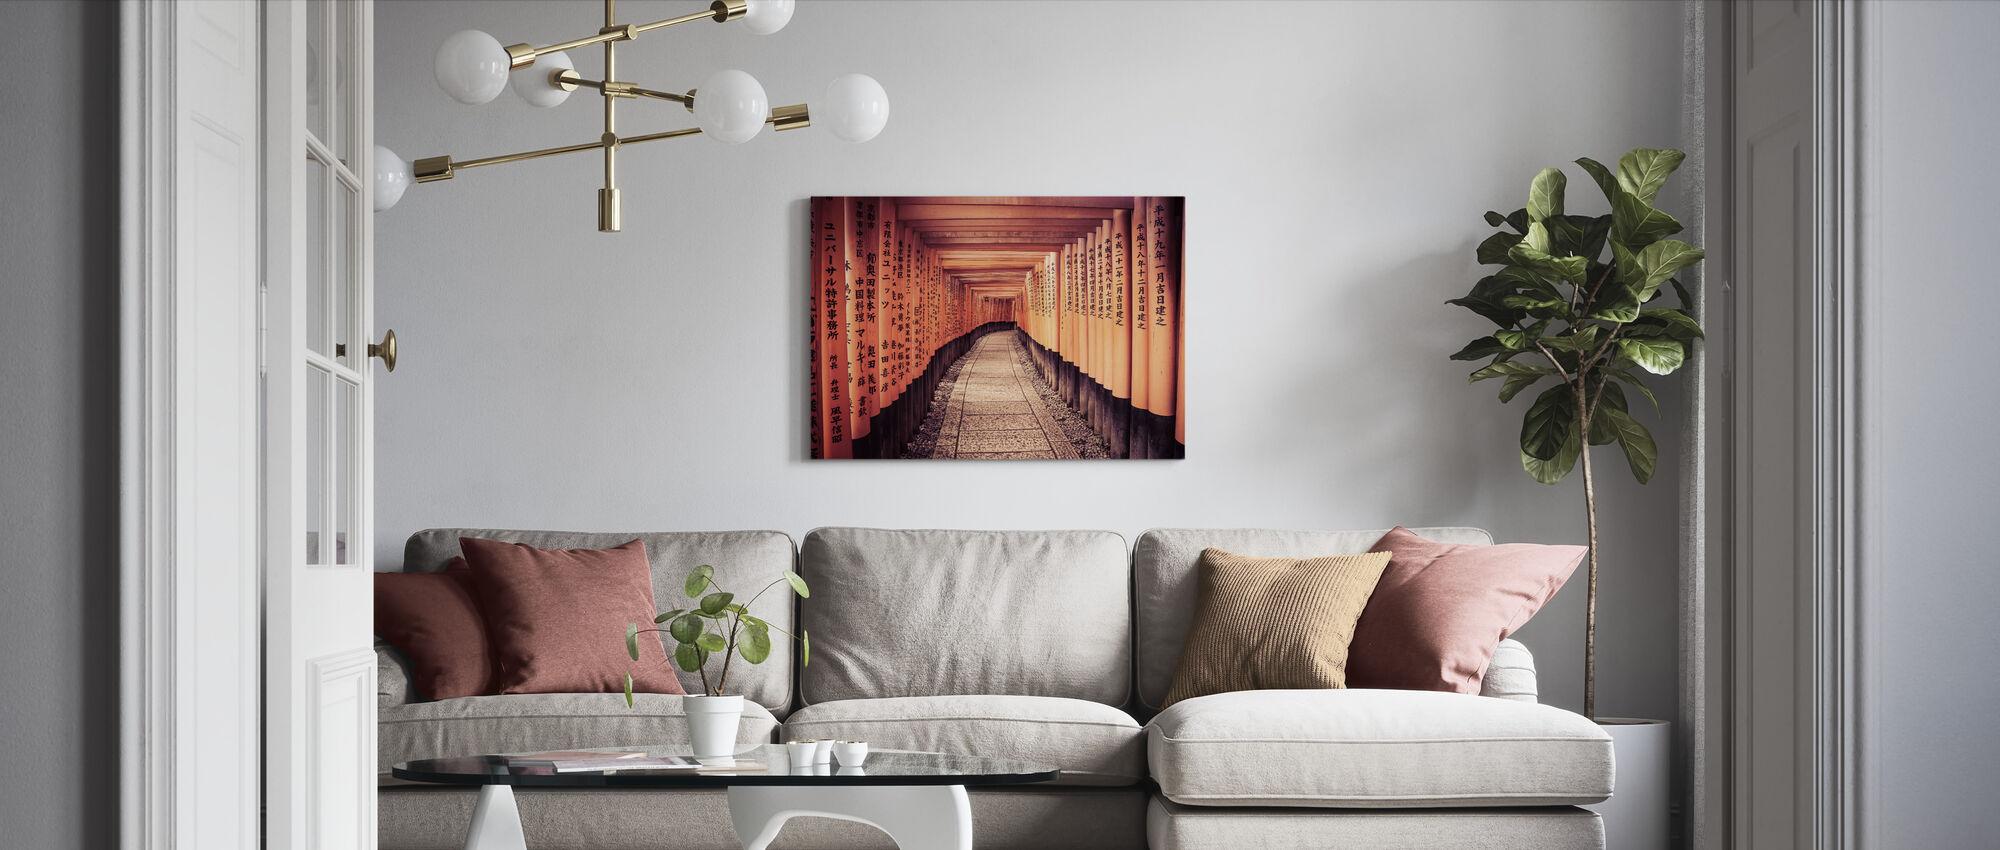 Historische Kyoto-poorten in Japan - Canvas print - Woonkamer